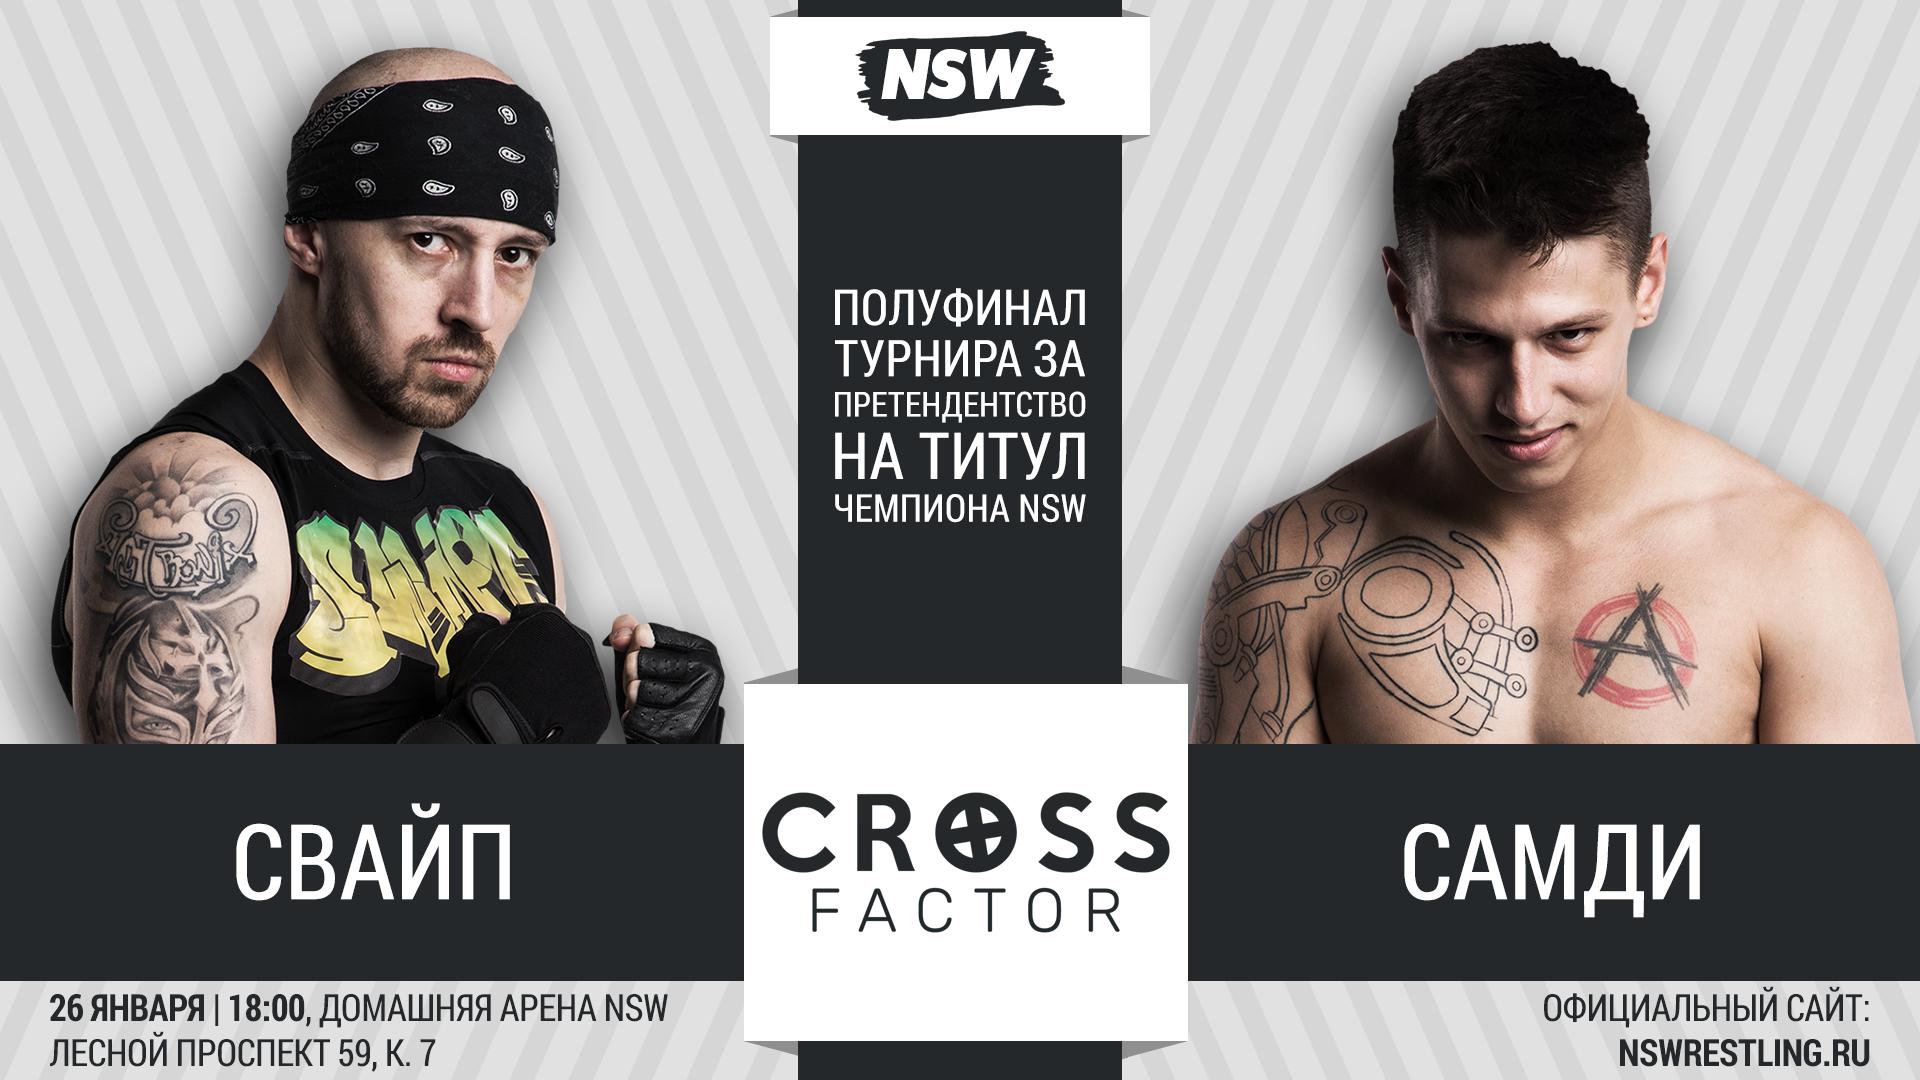 NSW Cross Factor (26/01): Свайп против Самди